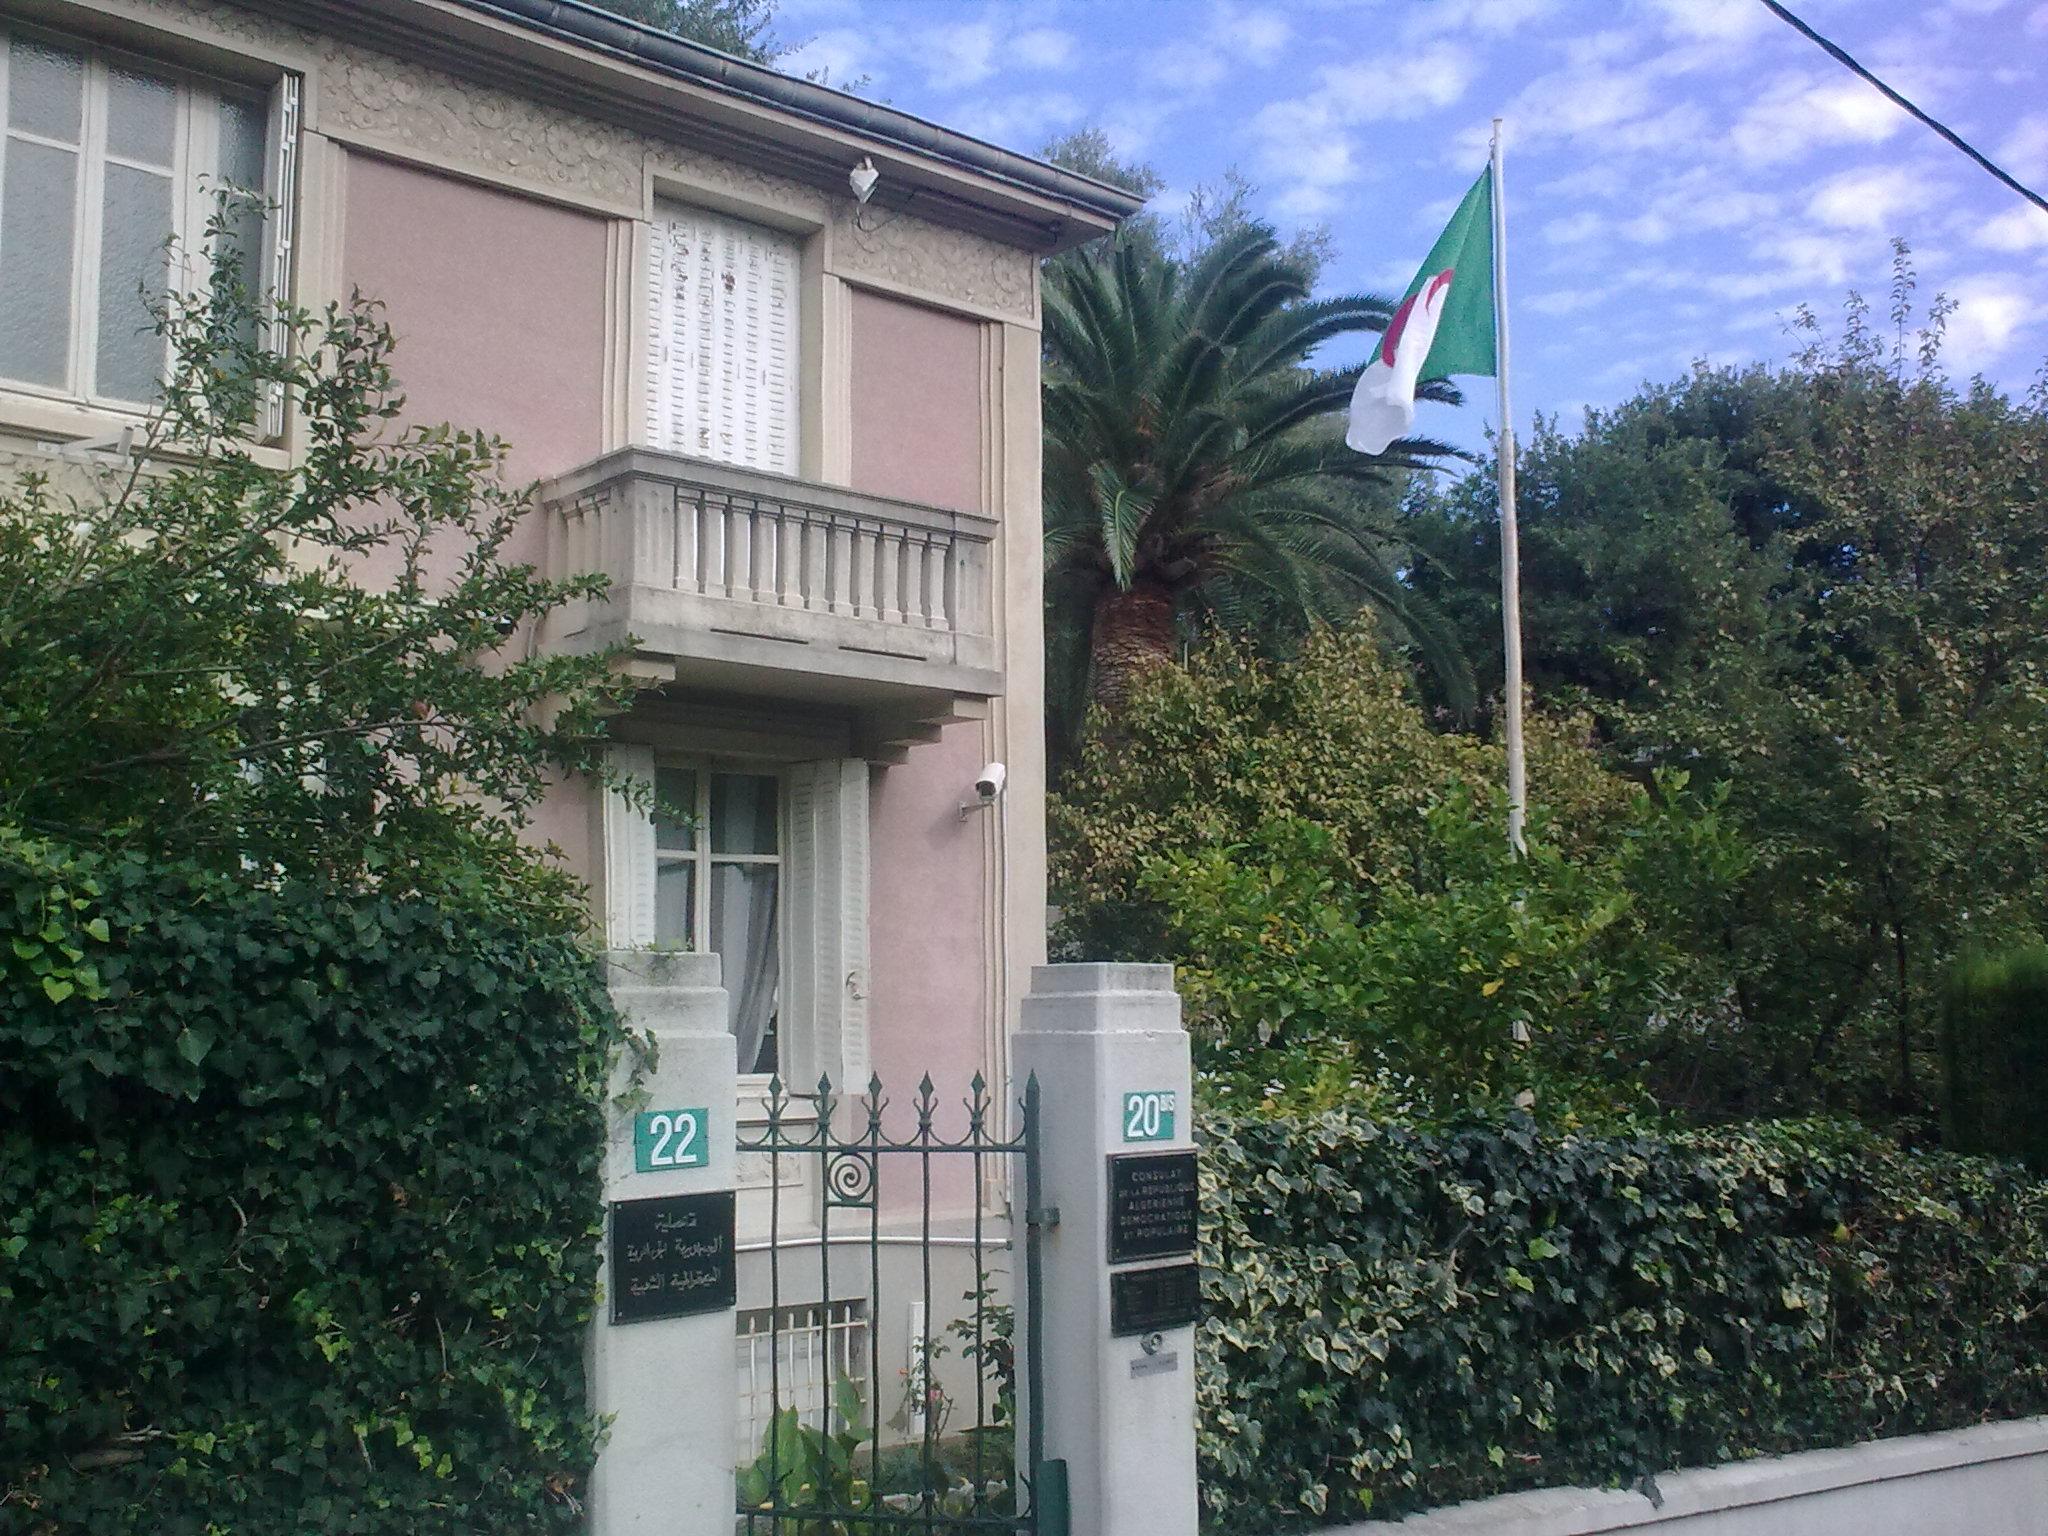 Carte Consulaire Algerie Lille.Consulat D Algerie A Nice Euro Algerie News Reflexions